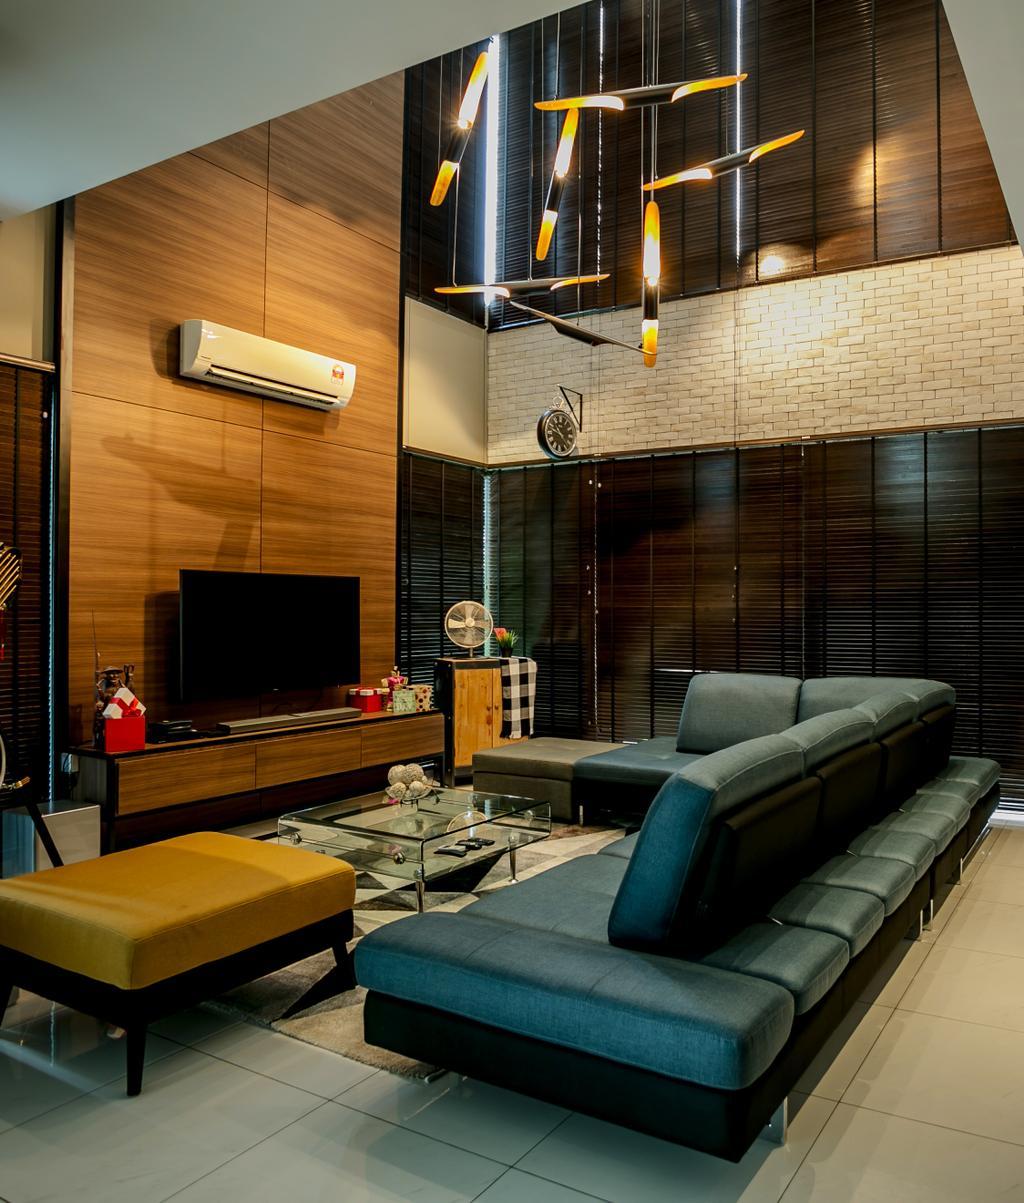 Landed, Akira Sierra, Interior Designer, M innovative Builders, Couch, Furniture, Indoors, Interior Design